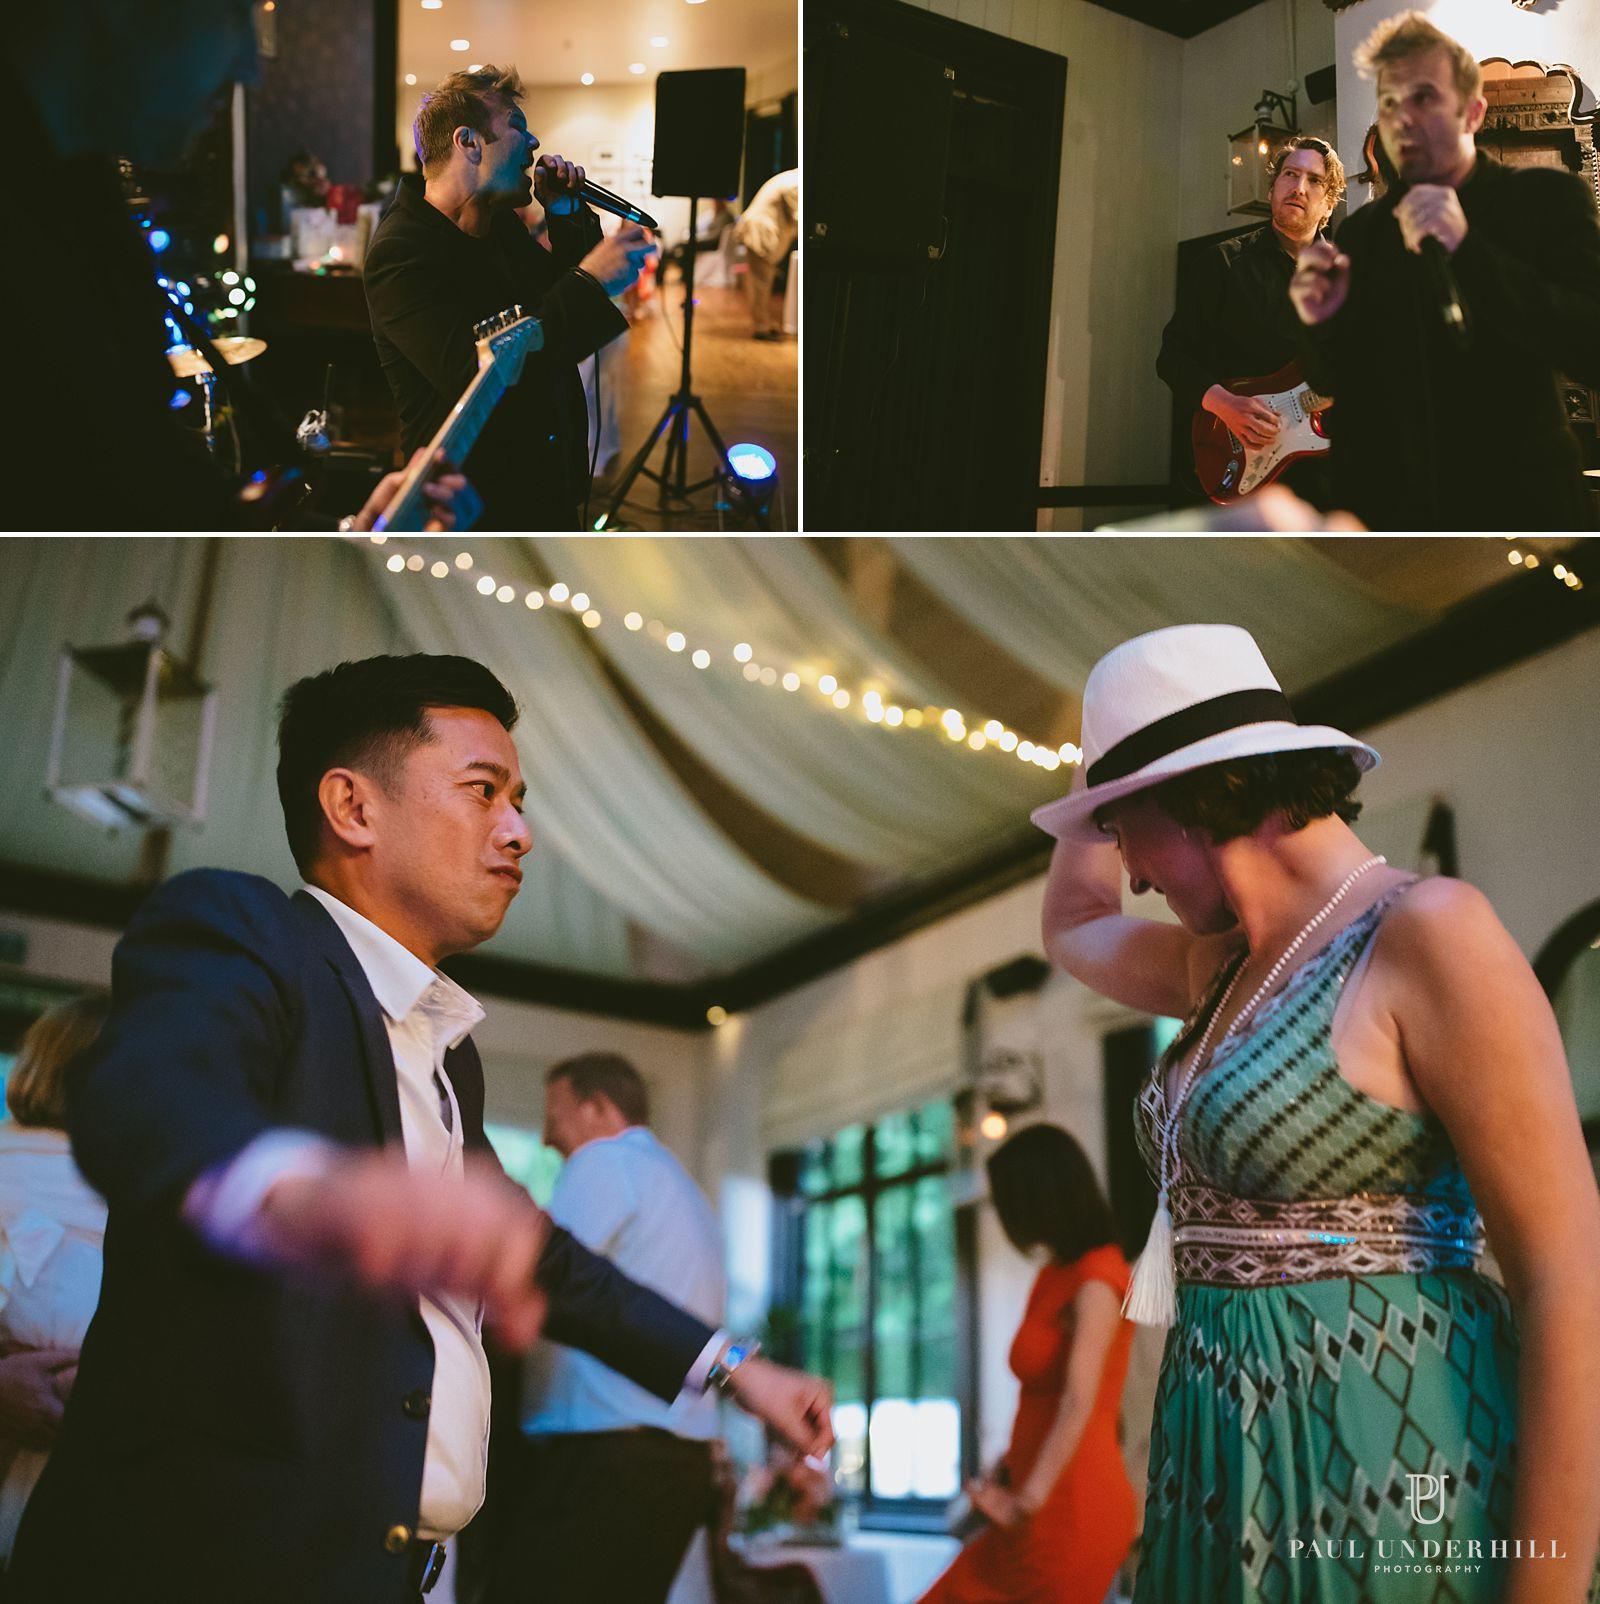 Live band and guests dancing at wedding